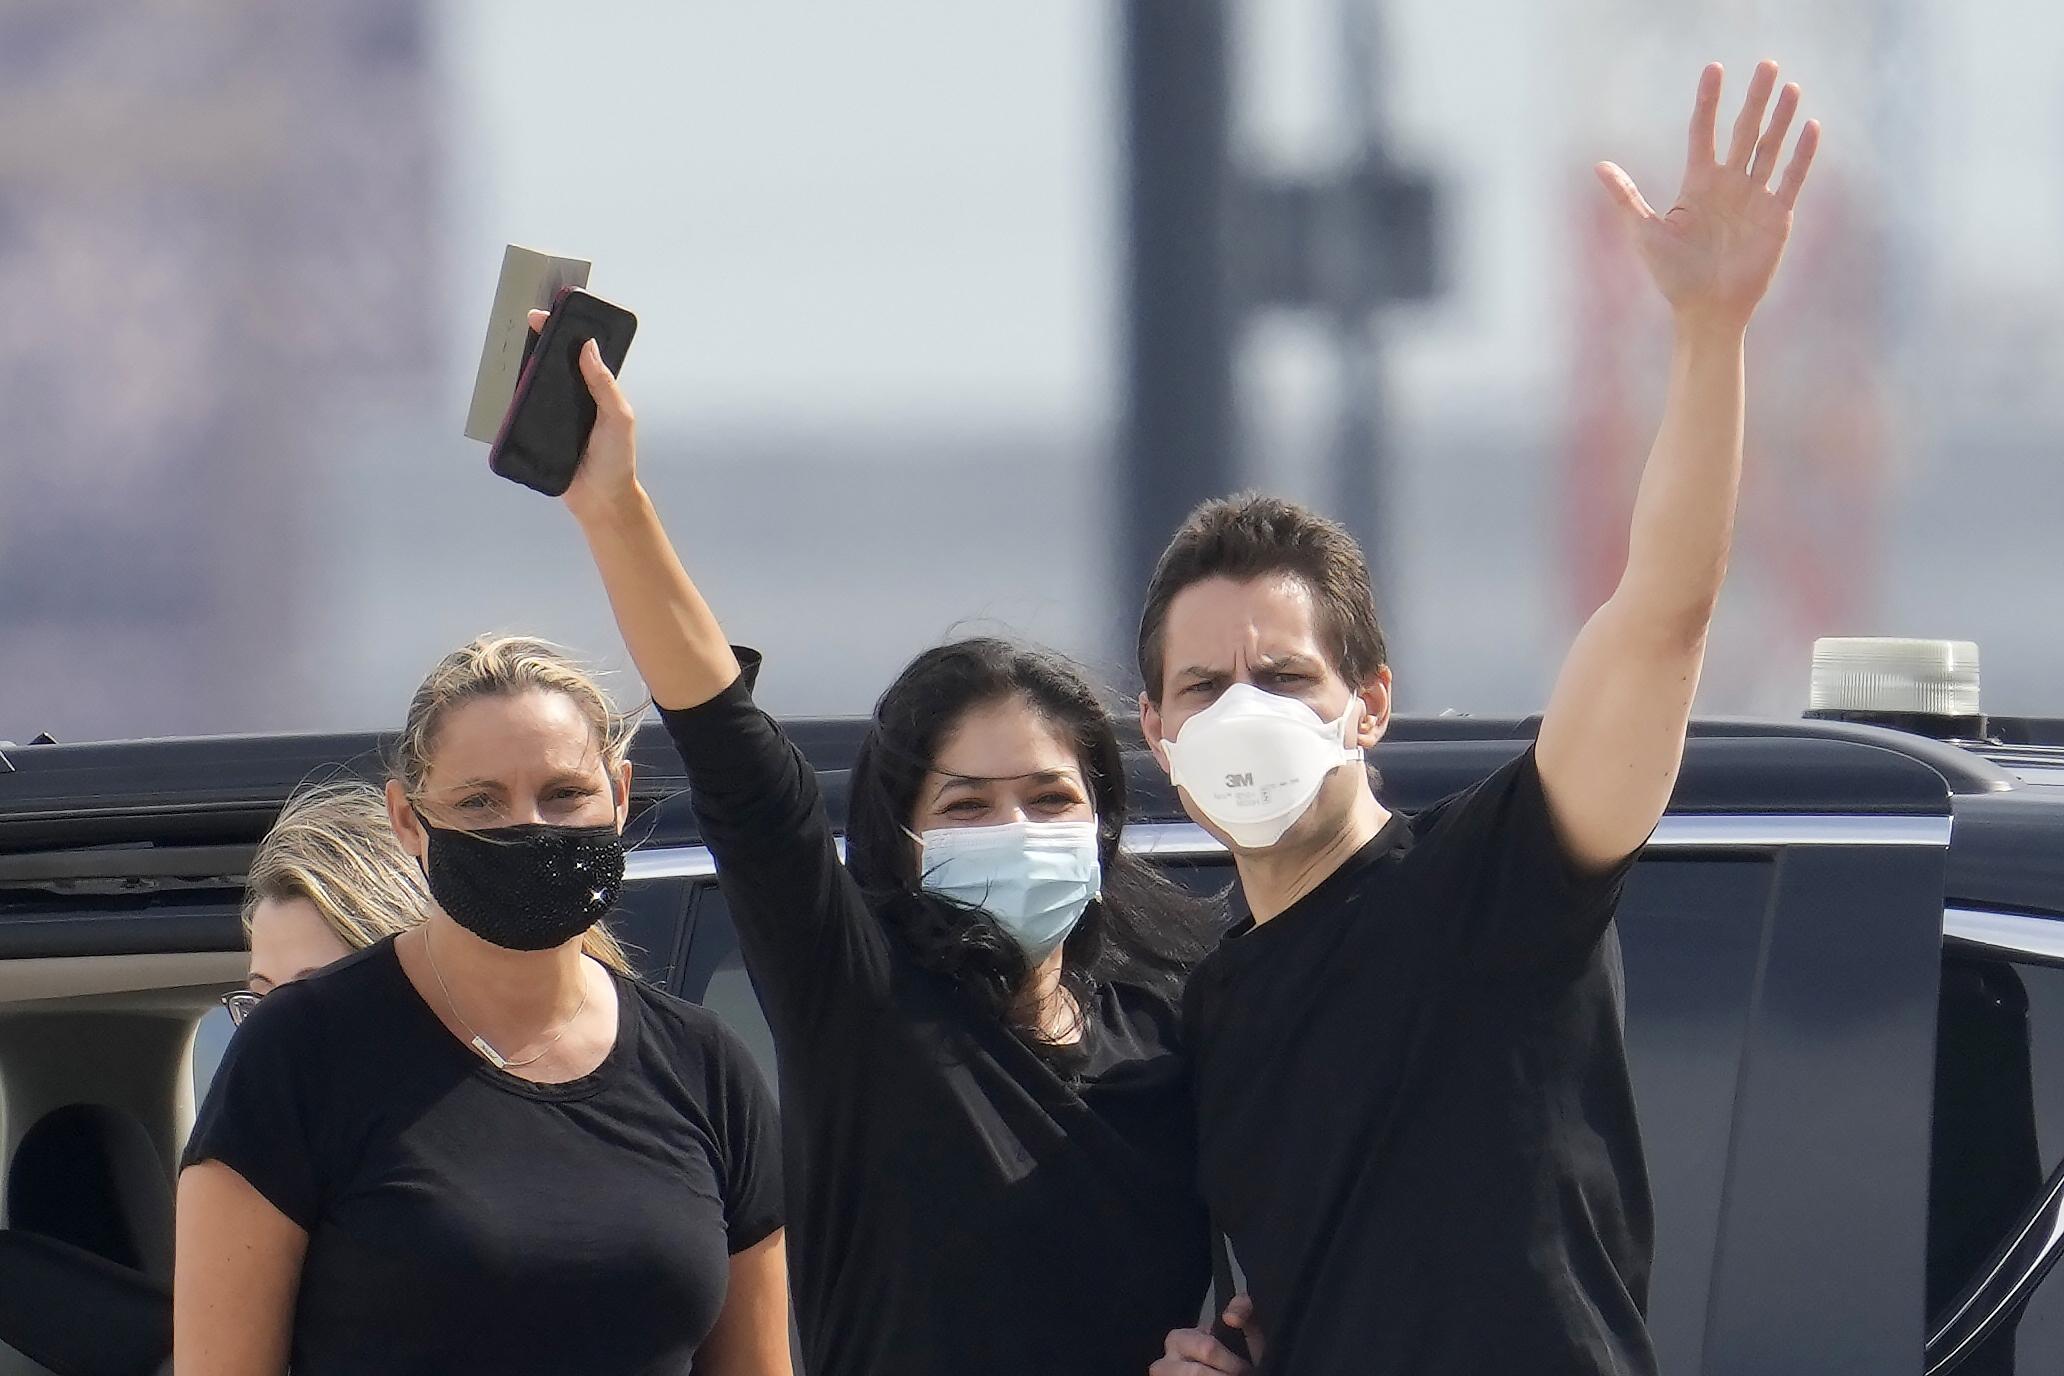 Michael Kovrig (right) with his wife Vina Nadjibulla (center) and sister Ariana Botha (left) at Pearson International Airport in Toronto on Saturday